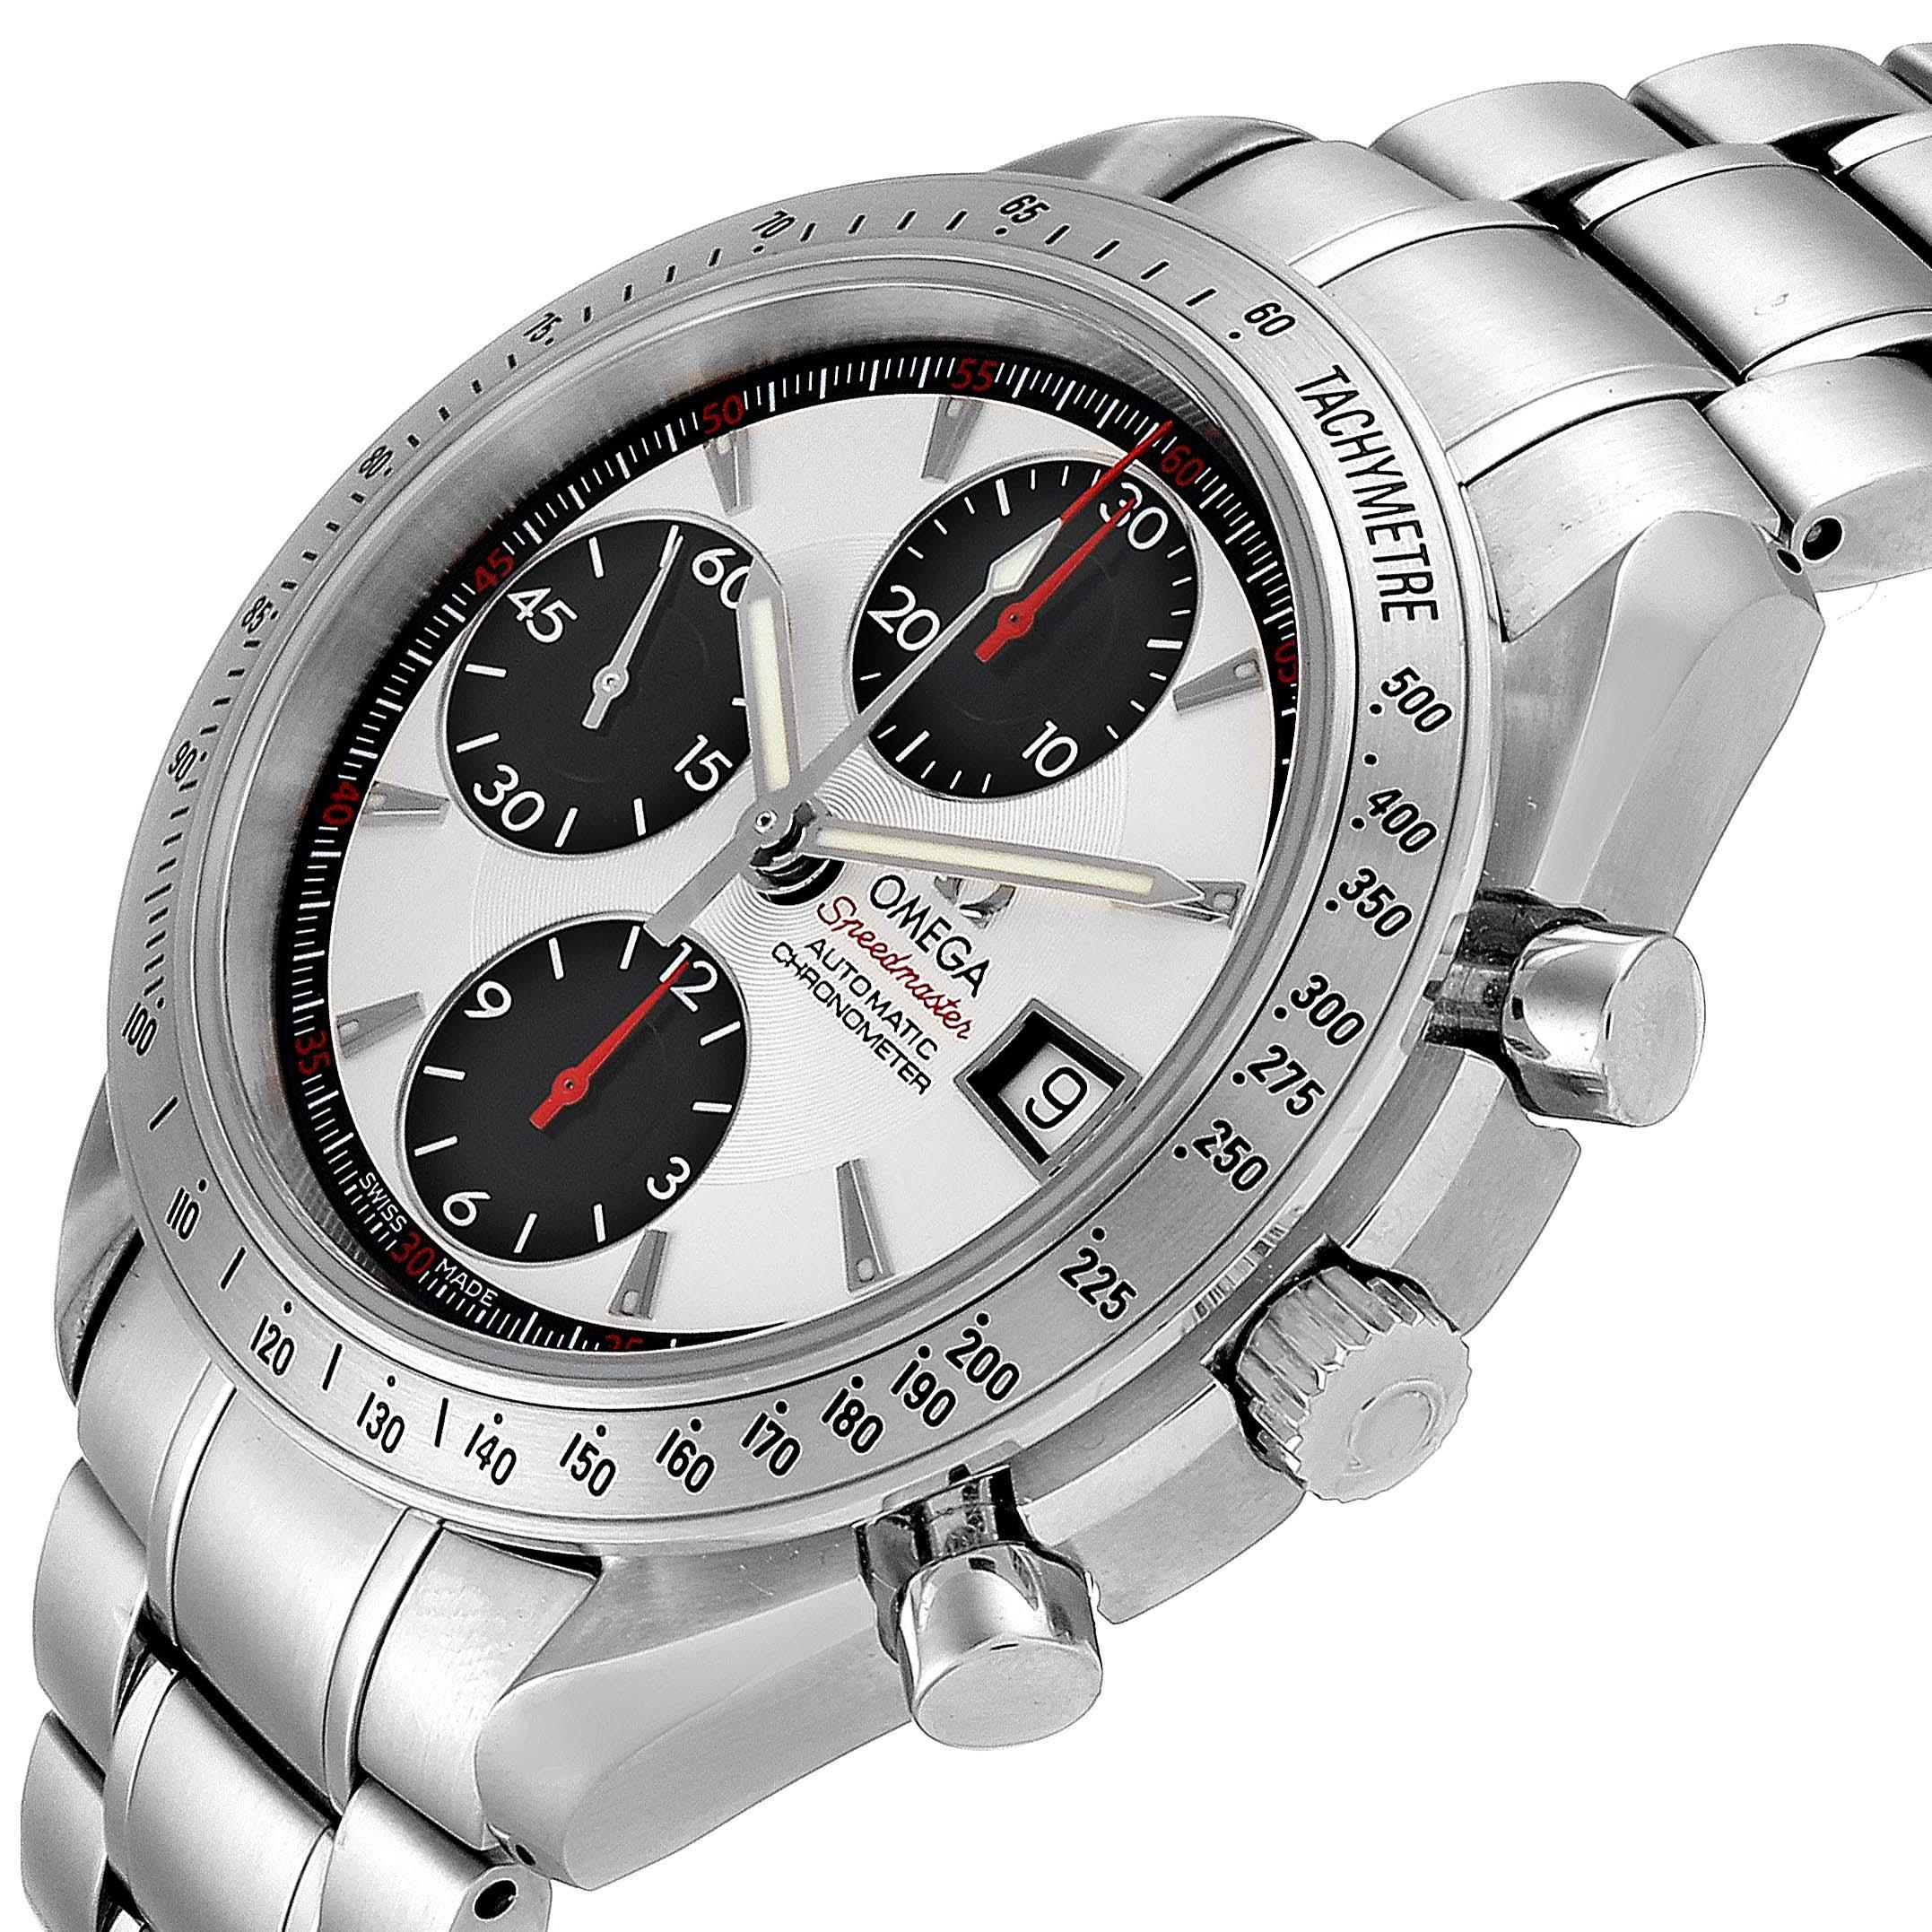 Omega Speedmaster Date Panda Dial Chronograph Mens Watch 3211.31.00 SwissWatchExpo